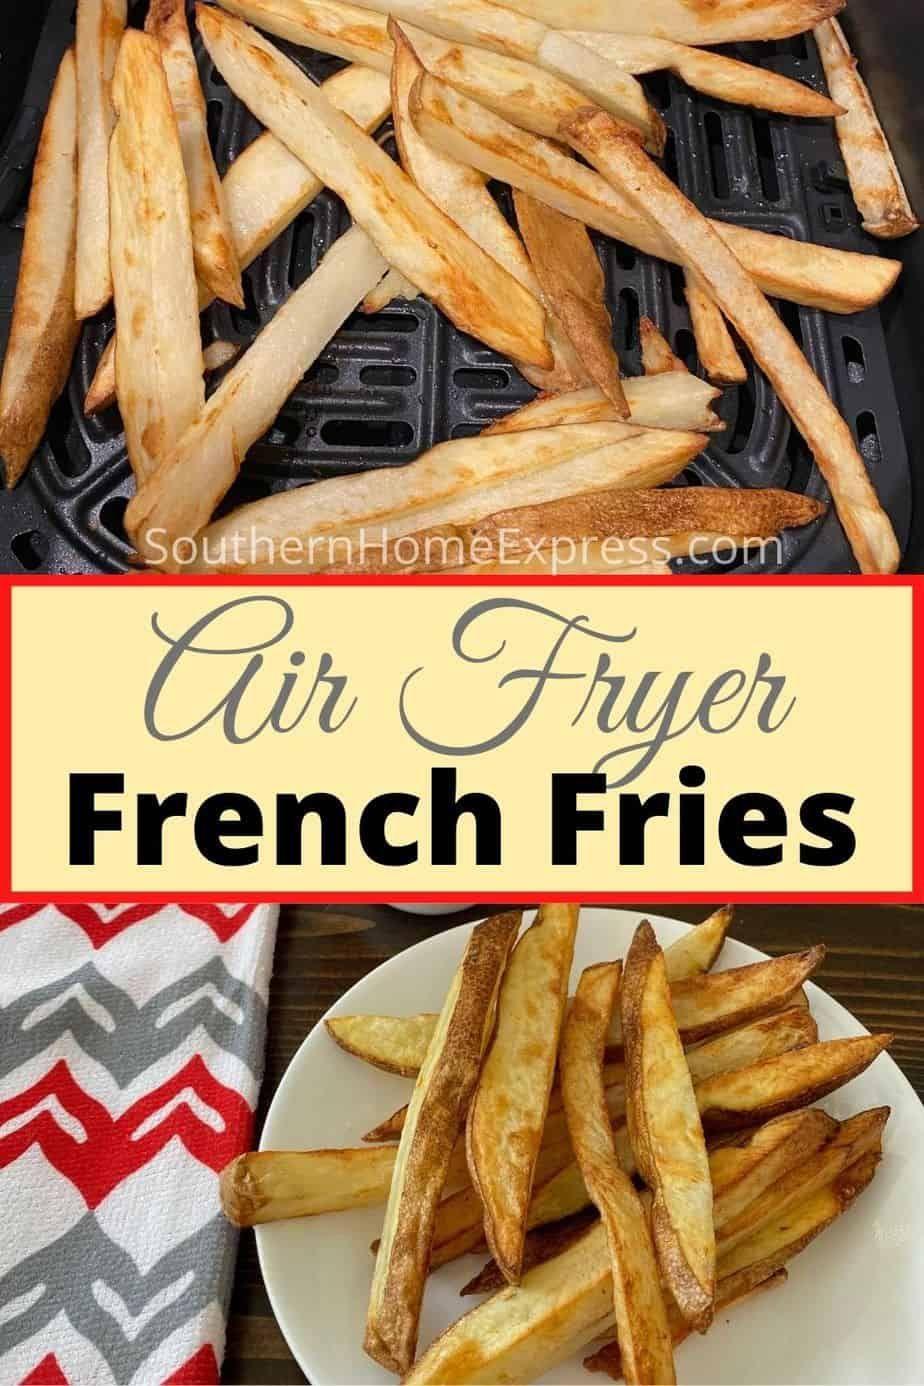 Best Air Fryer French Fries Recipe in 2020 Air fryer